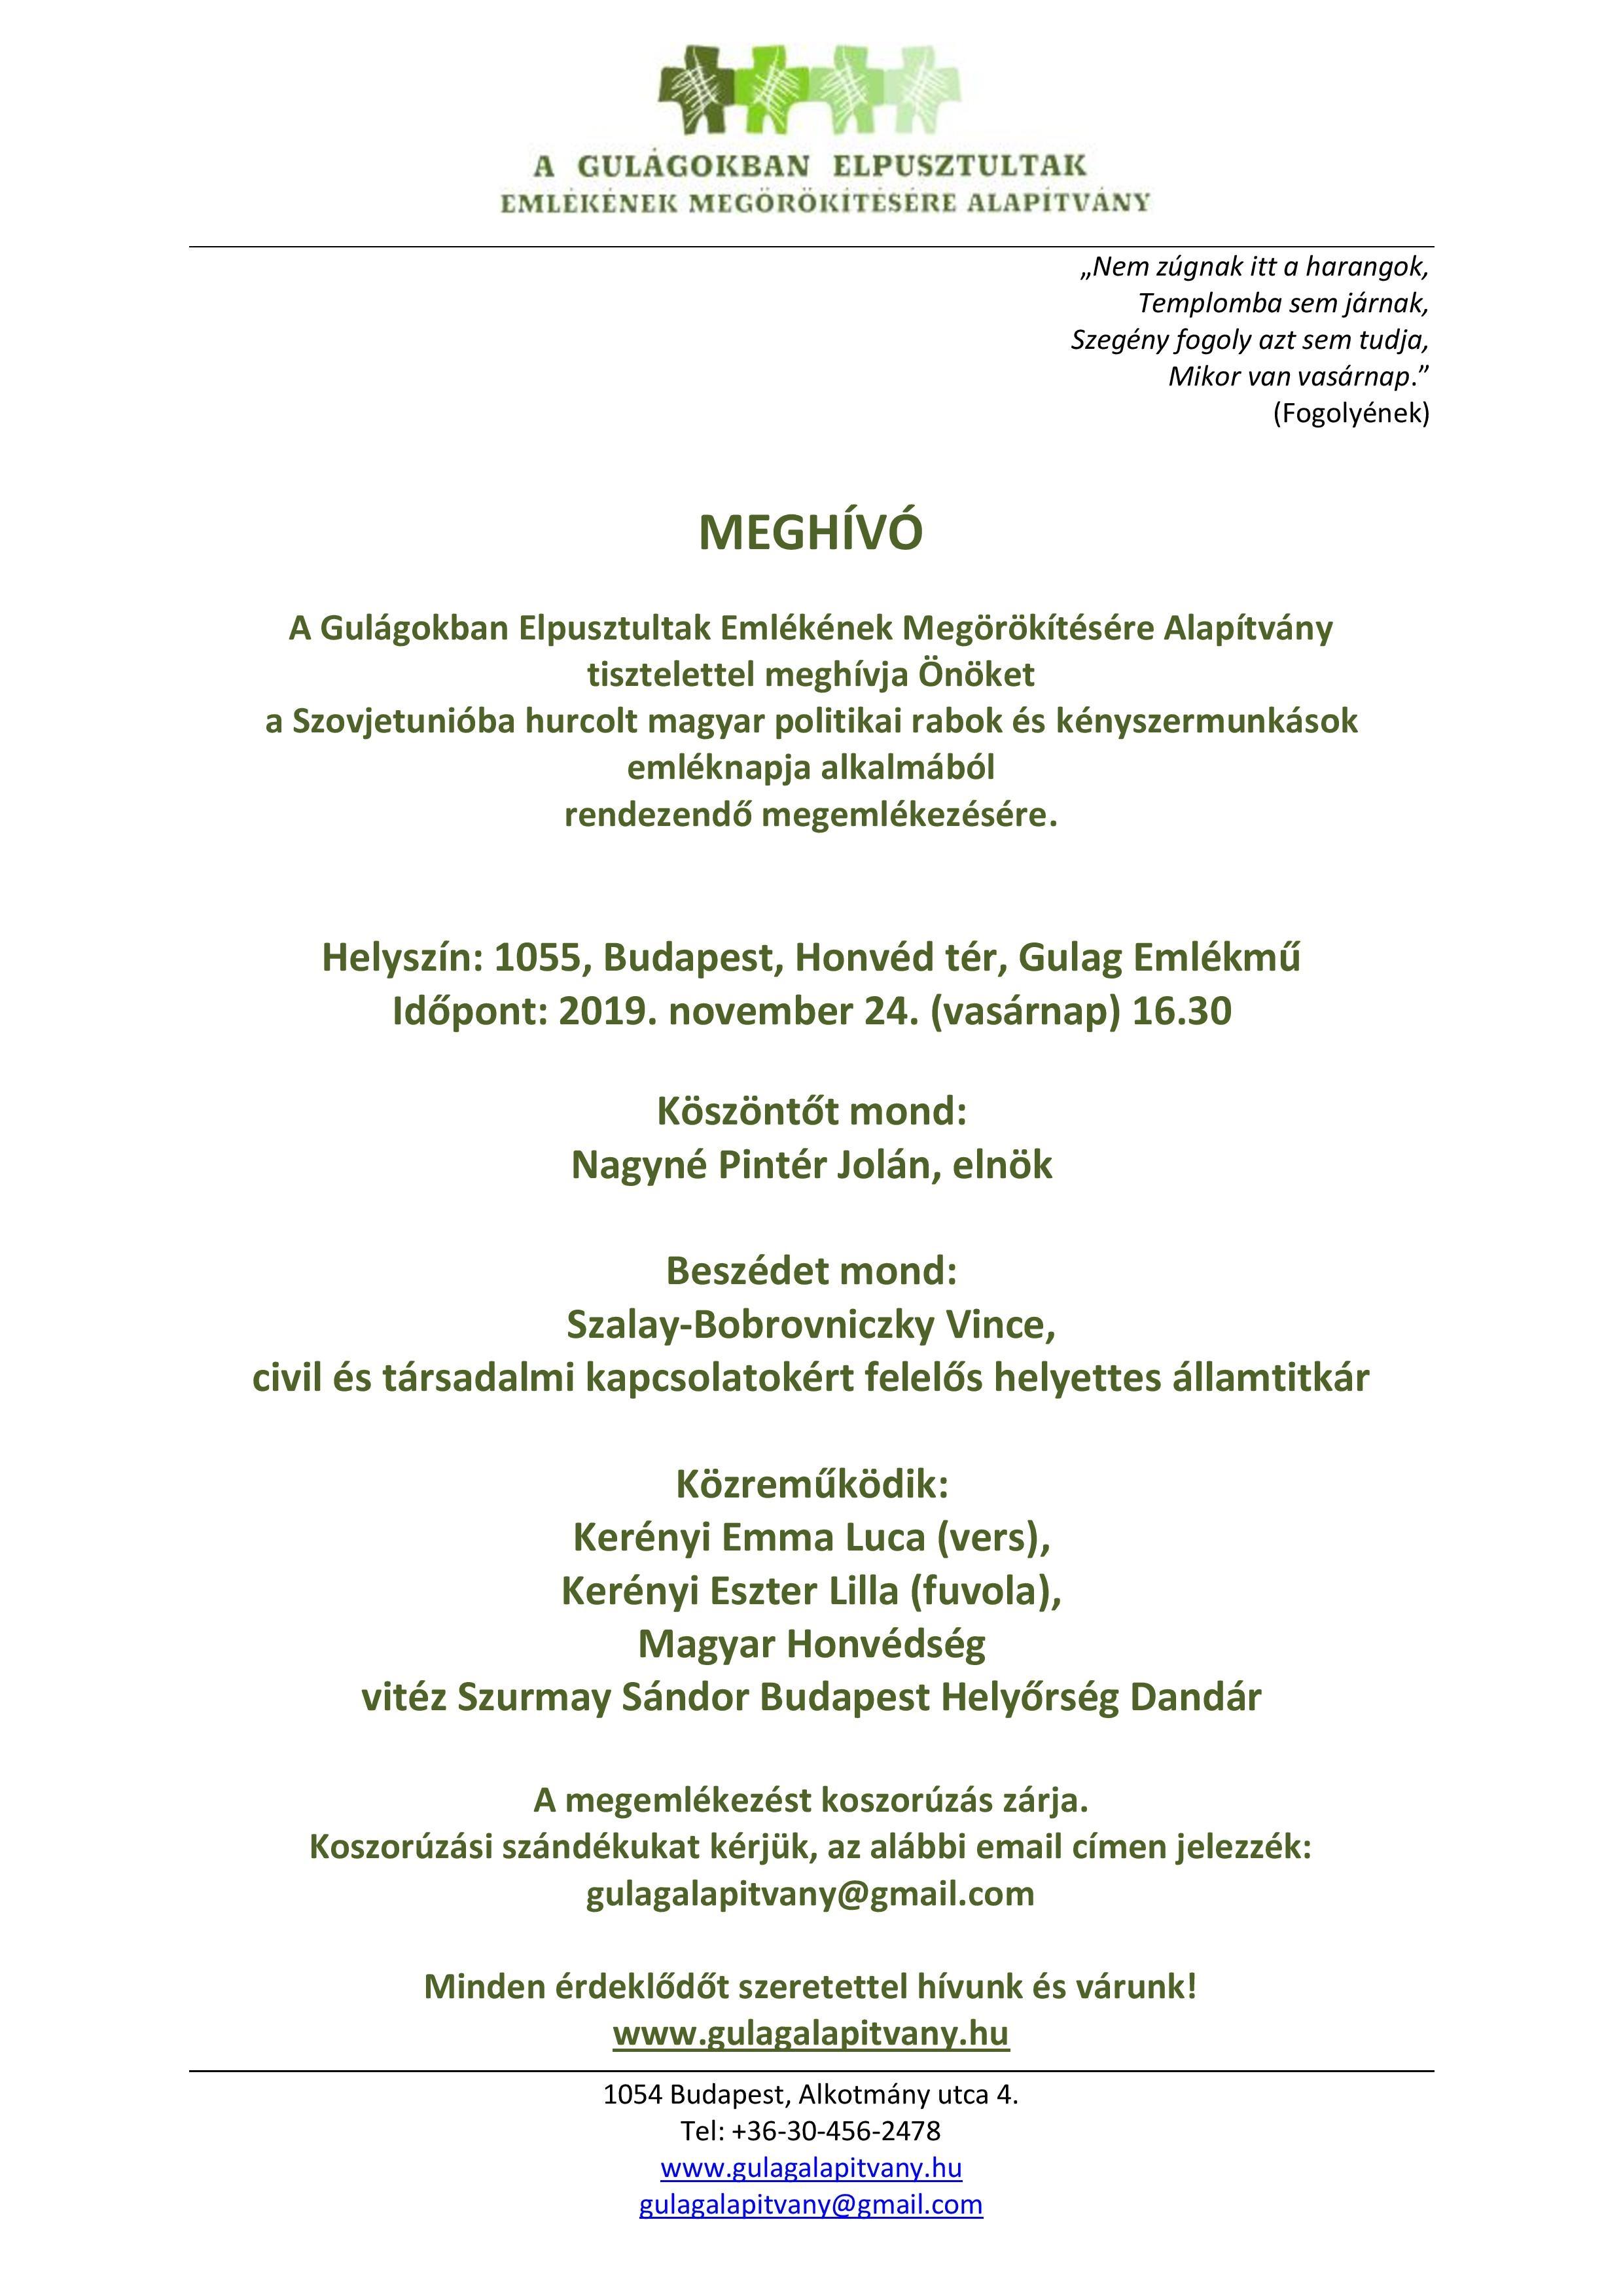 Meghívó - 2019. nov. 24. (5)-page-001